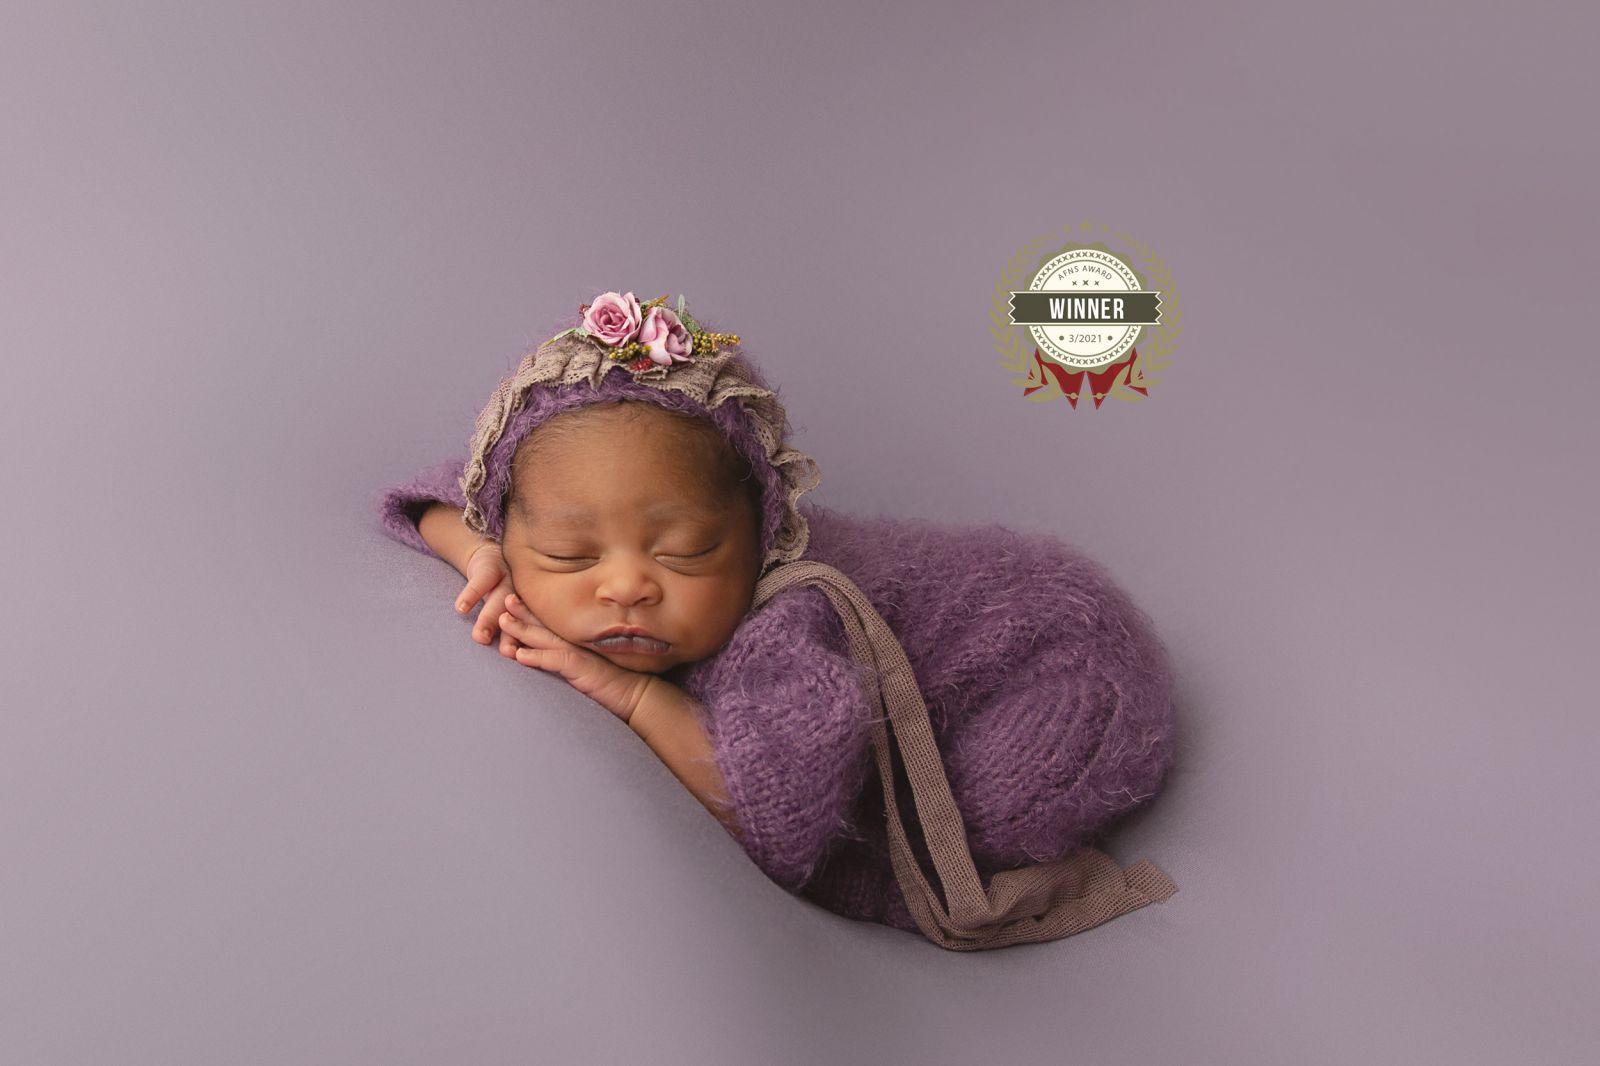 Award winning newborn photographer White Lavender Photography Dallas